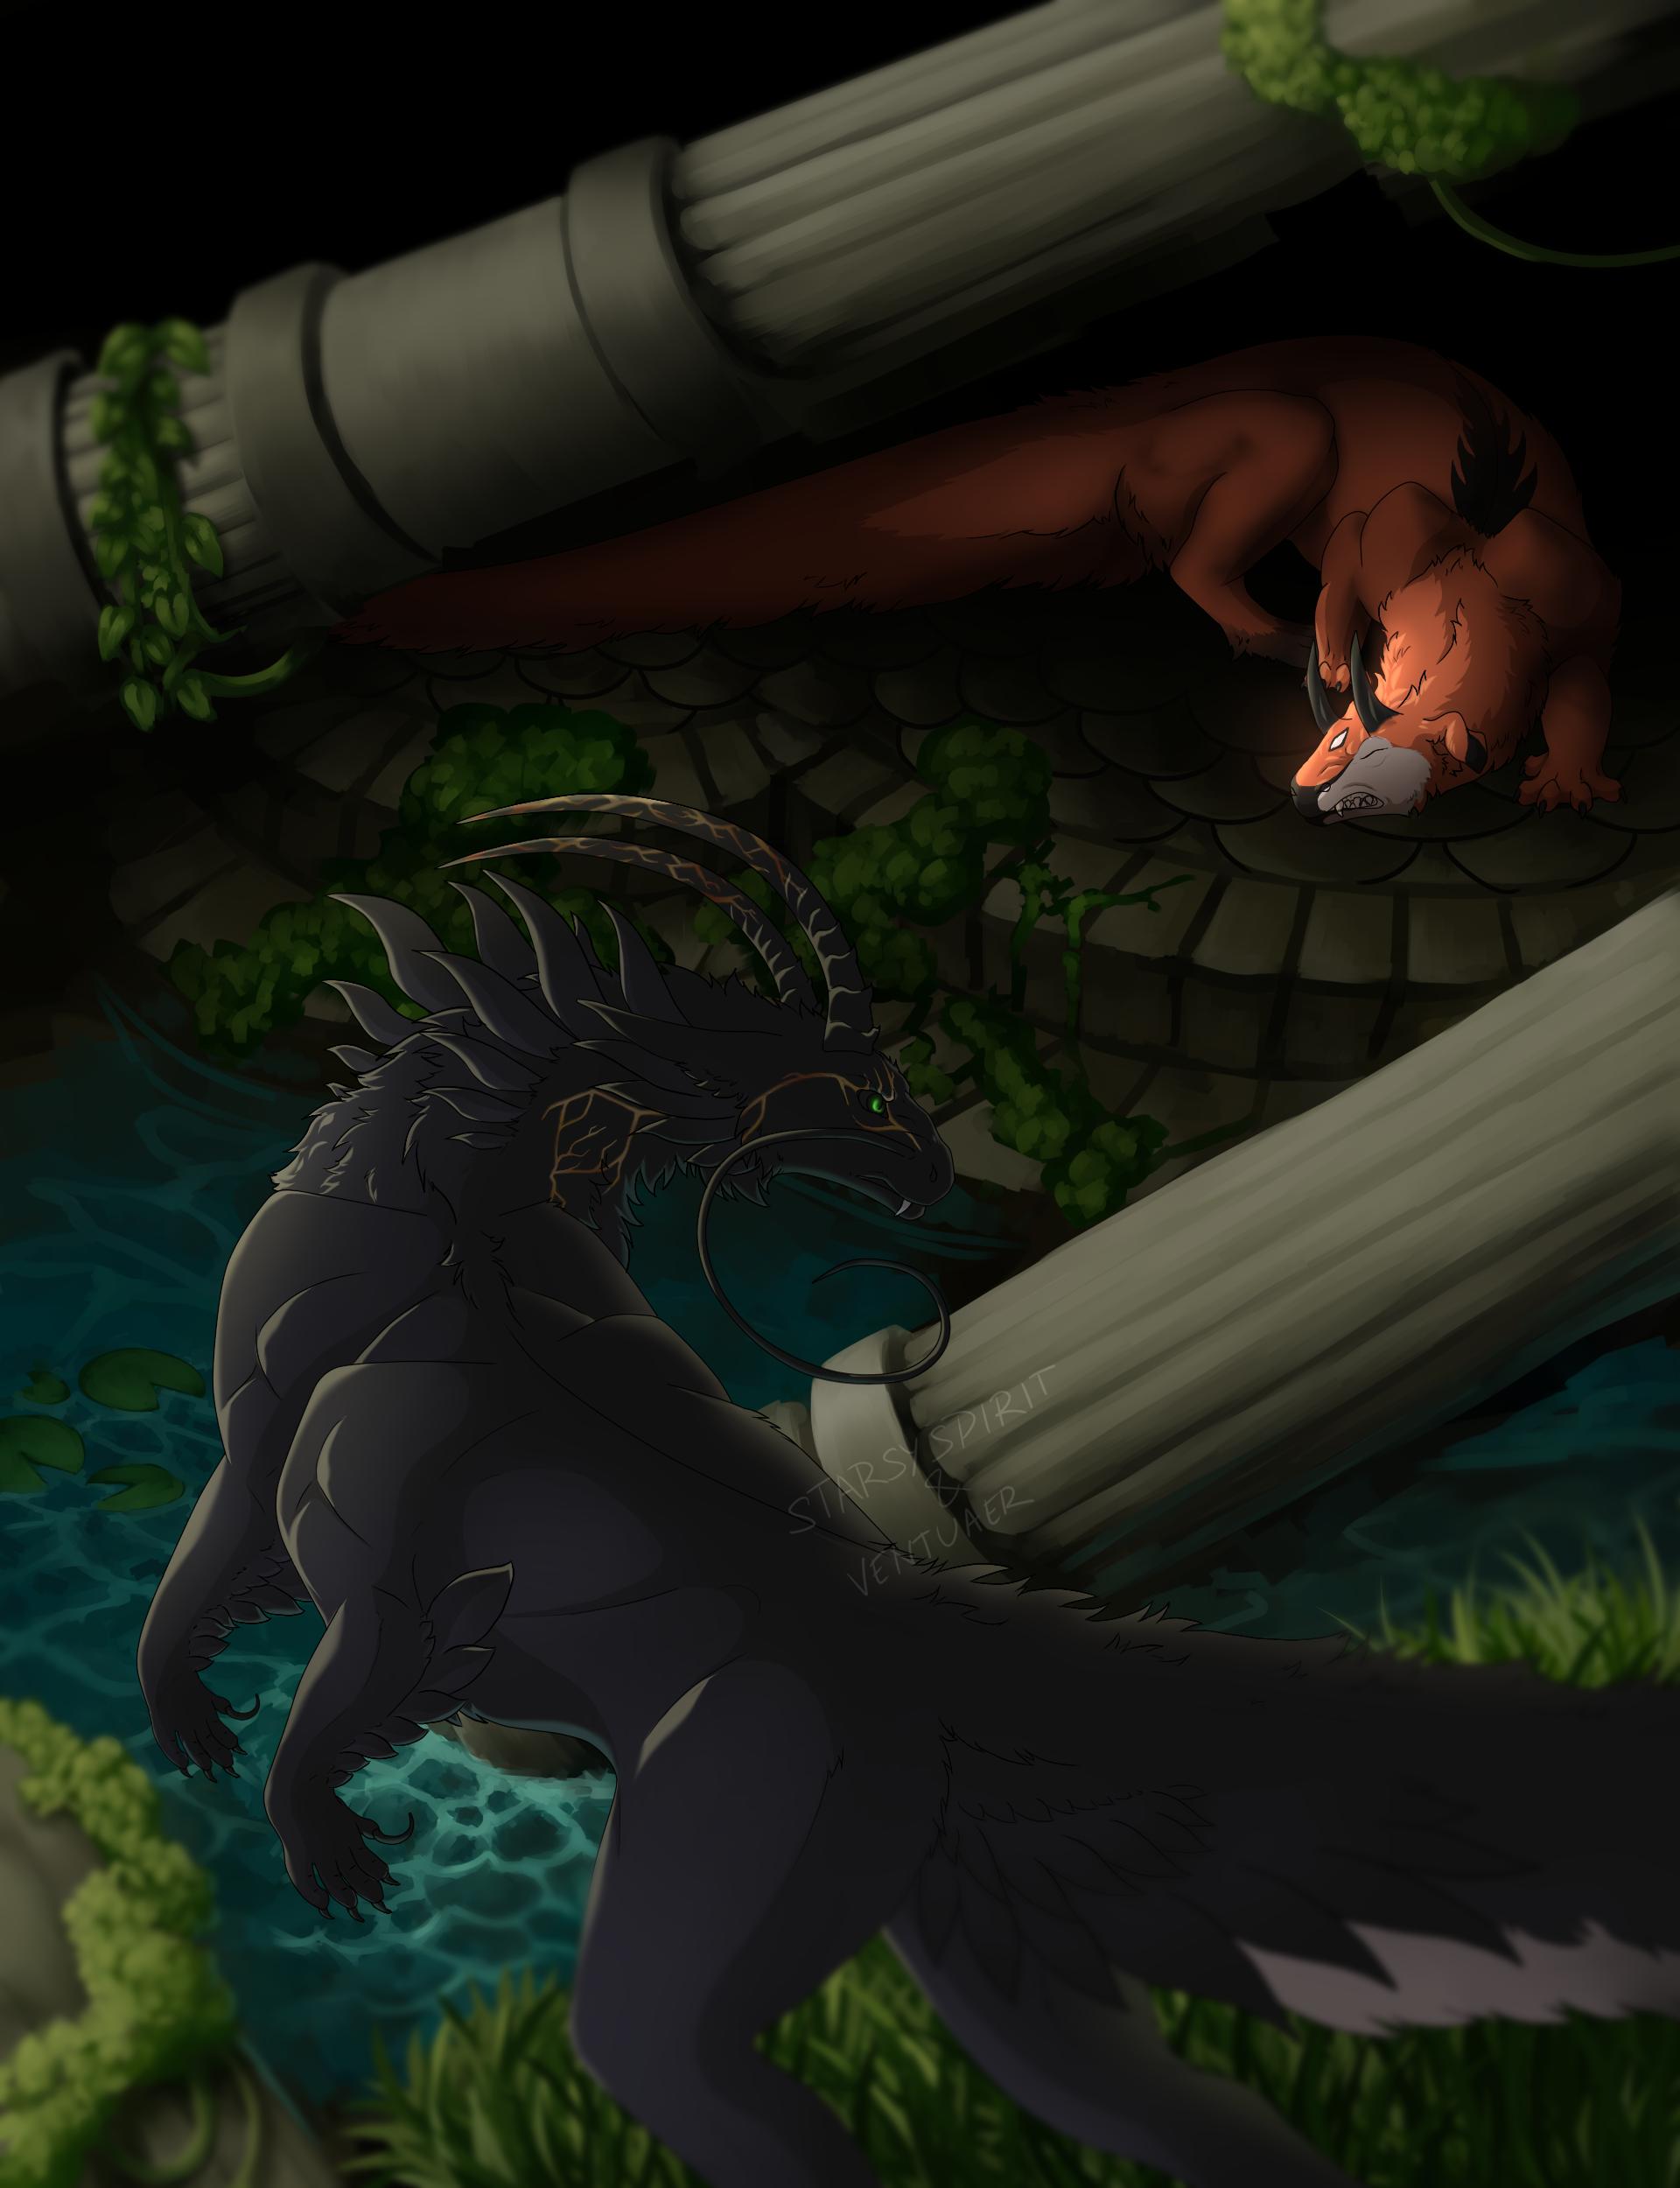 The Night versus the Lurker